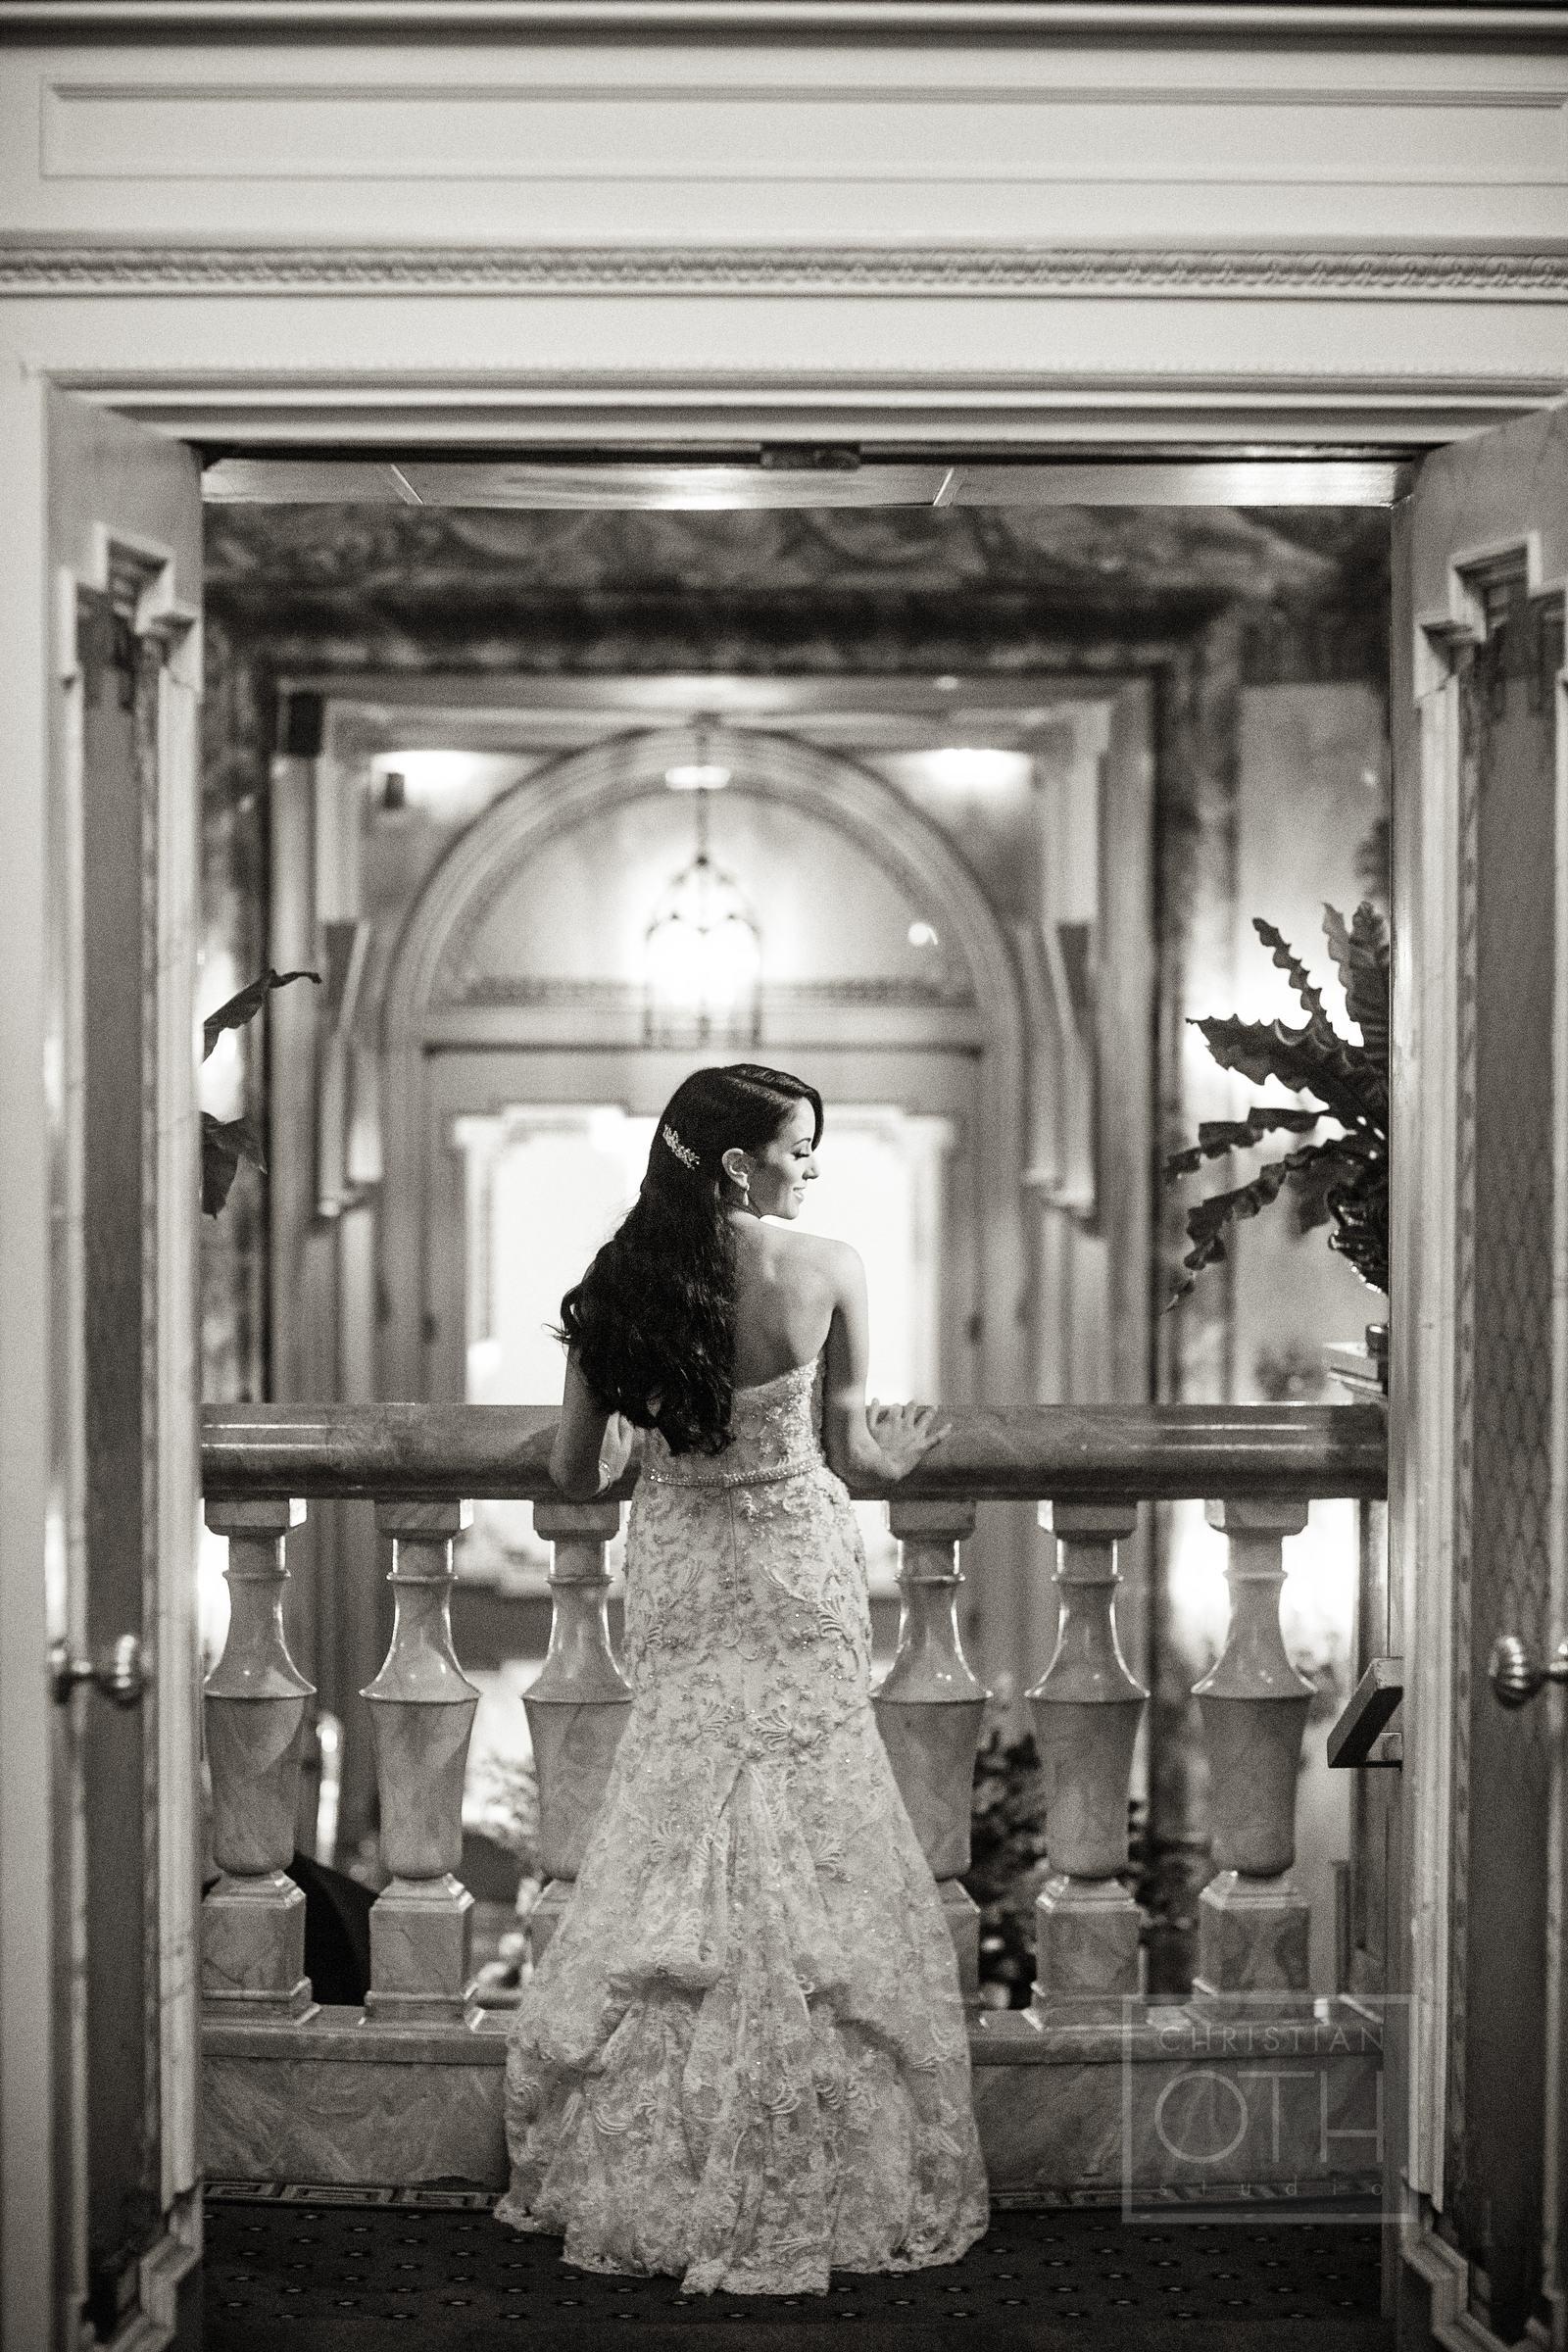 Ceci_New_York_Custom_Invitation_Pierre__City_ Destination_Wedding_Luxury_Personalized_Ceci_Style_Bride_Rose_Gold_Foil_Stamping49.JPG